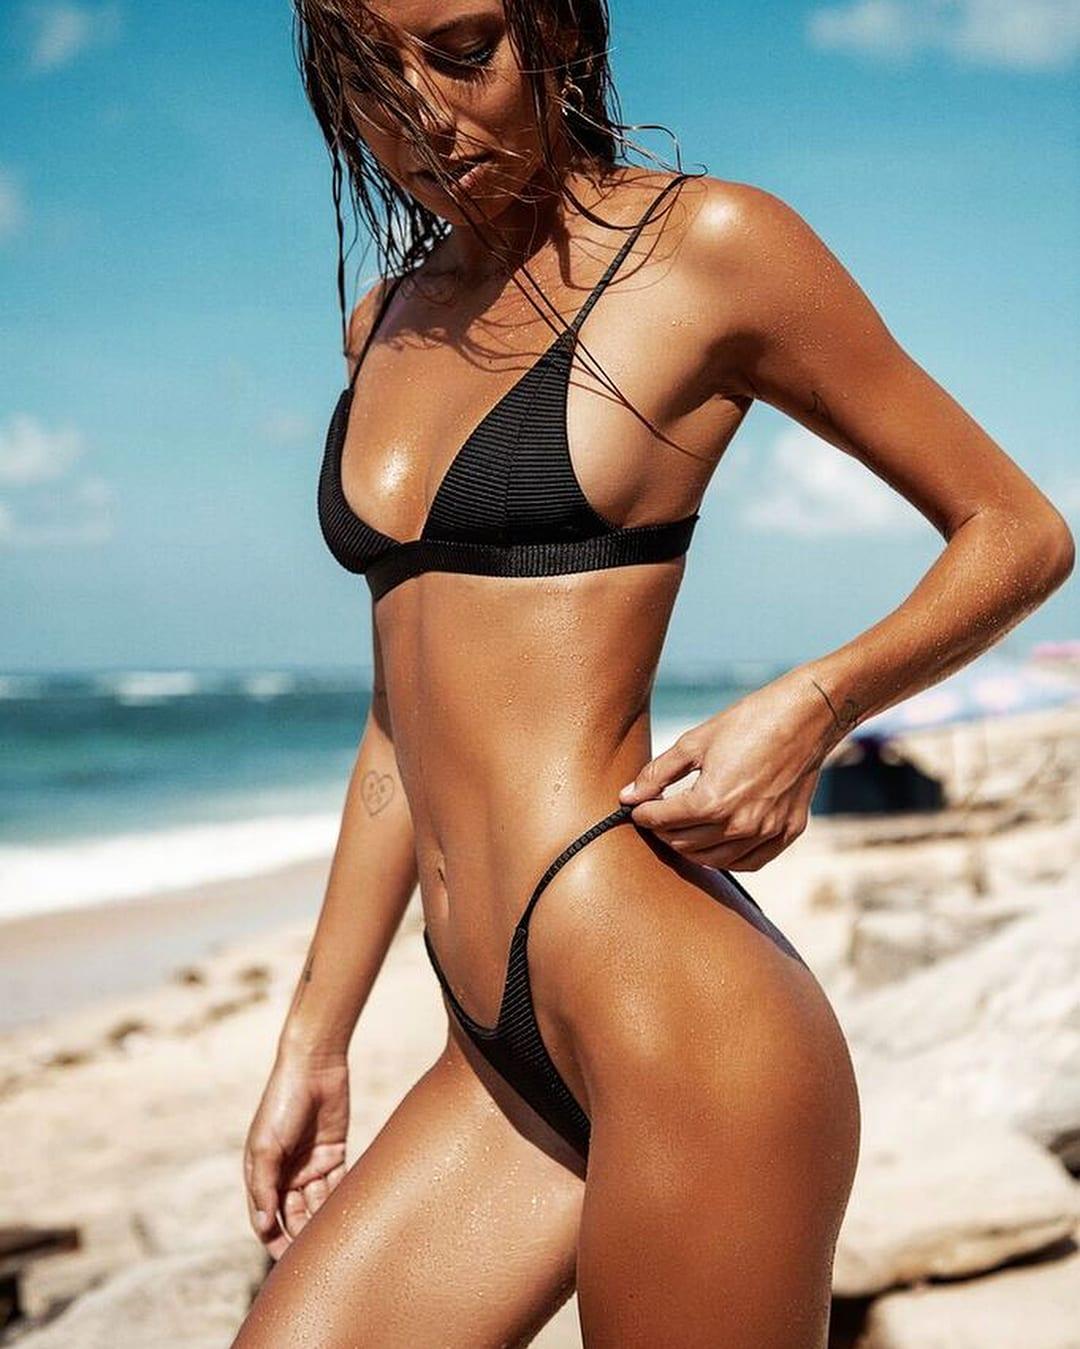 2019 Kati Garnett nude (42 photos), Paparazzi